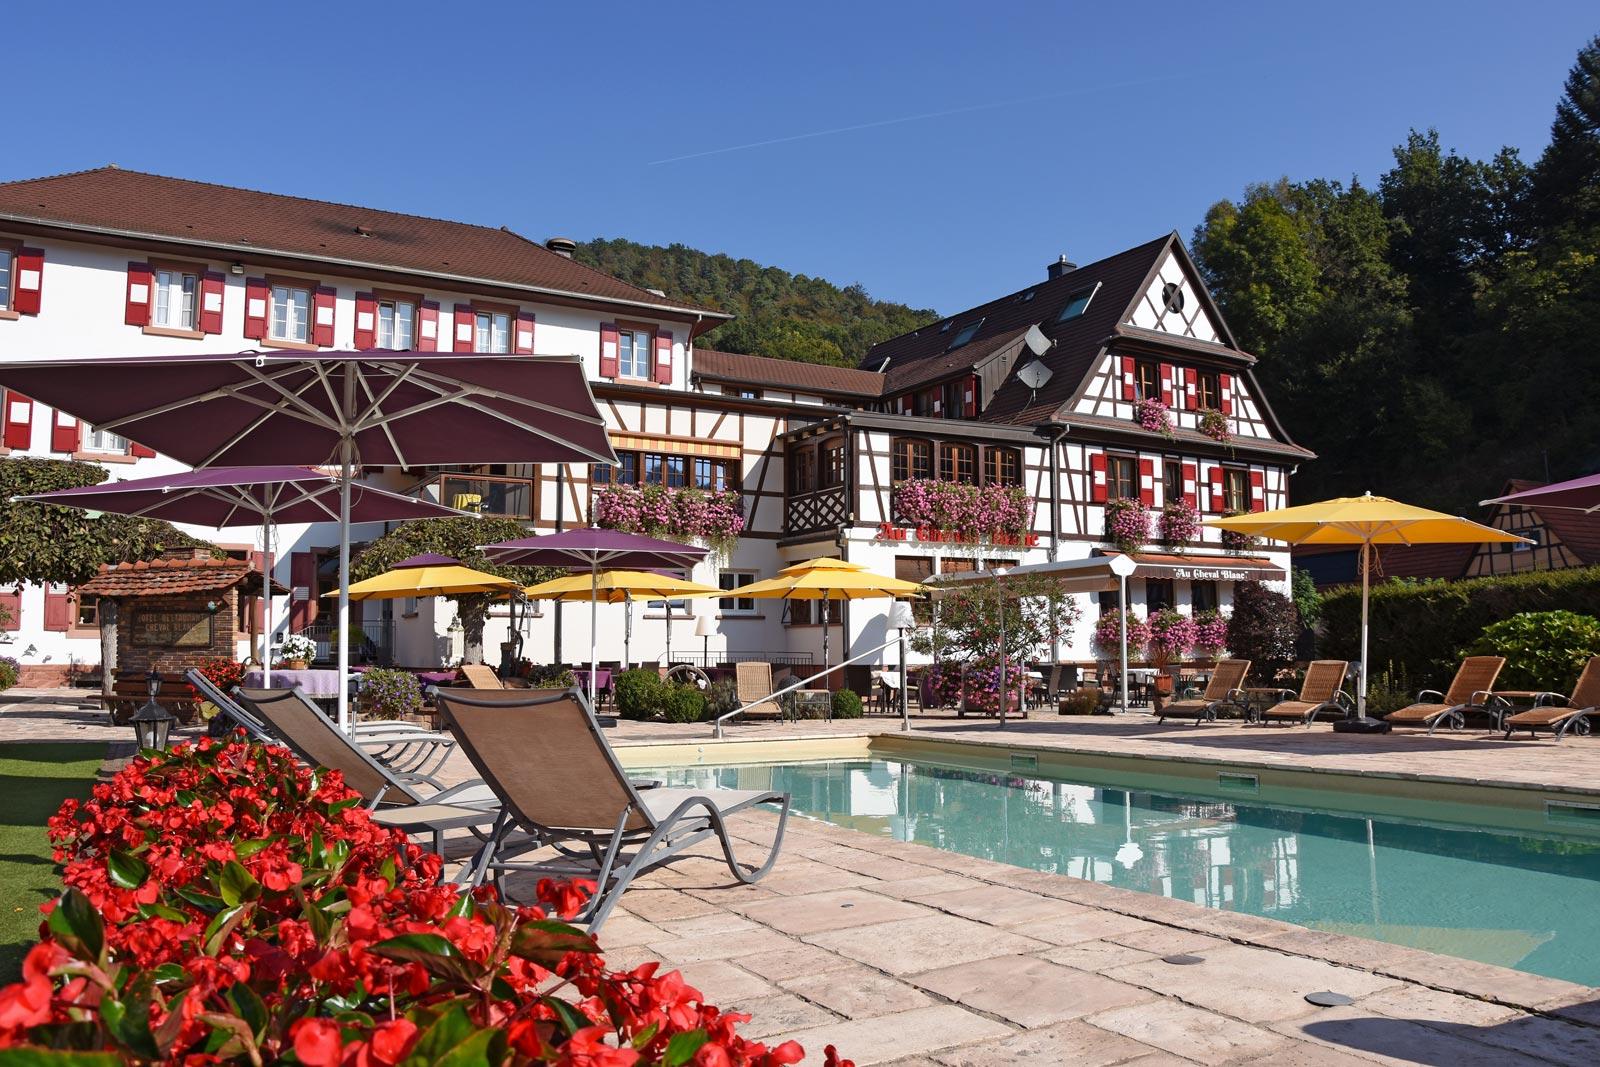 Hôtel-restaurant Cheval Blanc